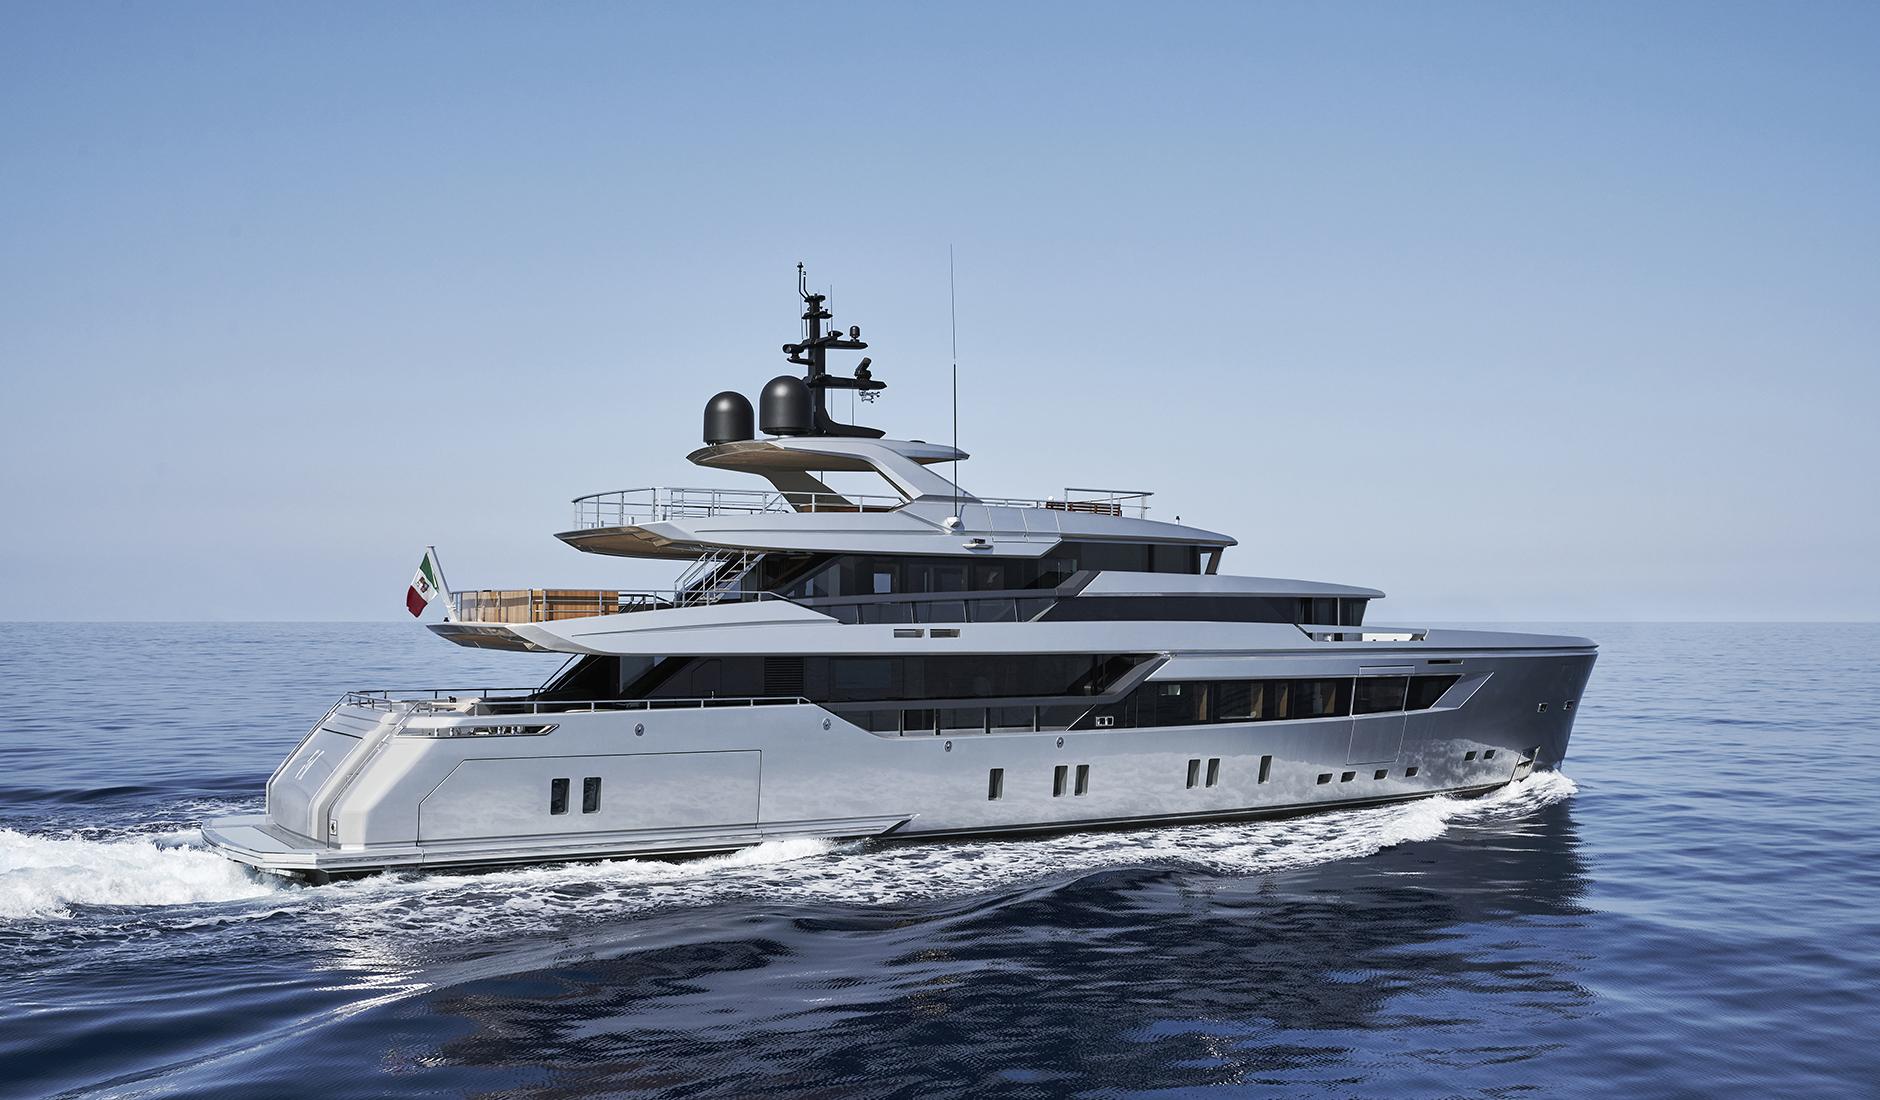 Купить яхту Sanlorenzo 44 Alloy